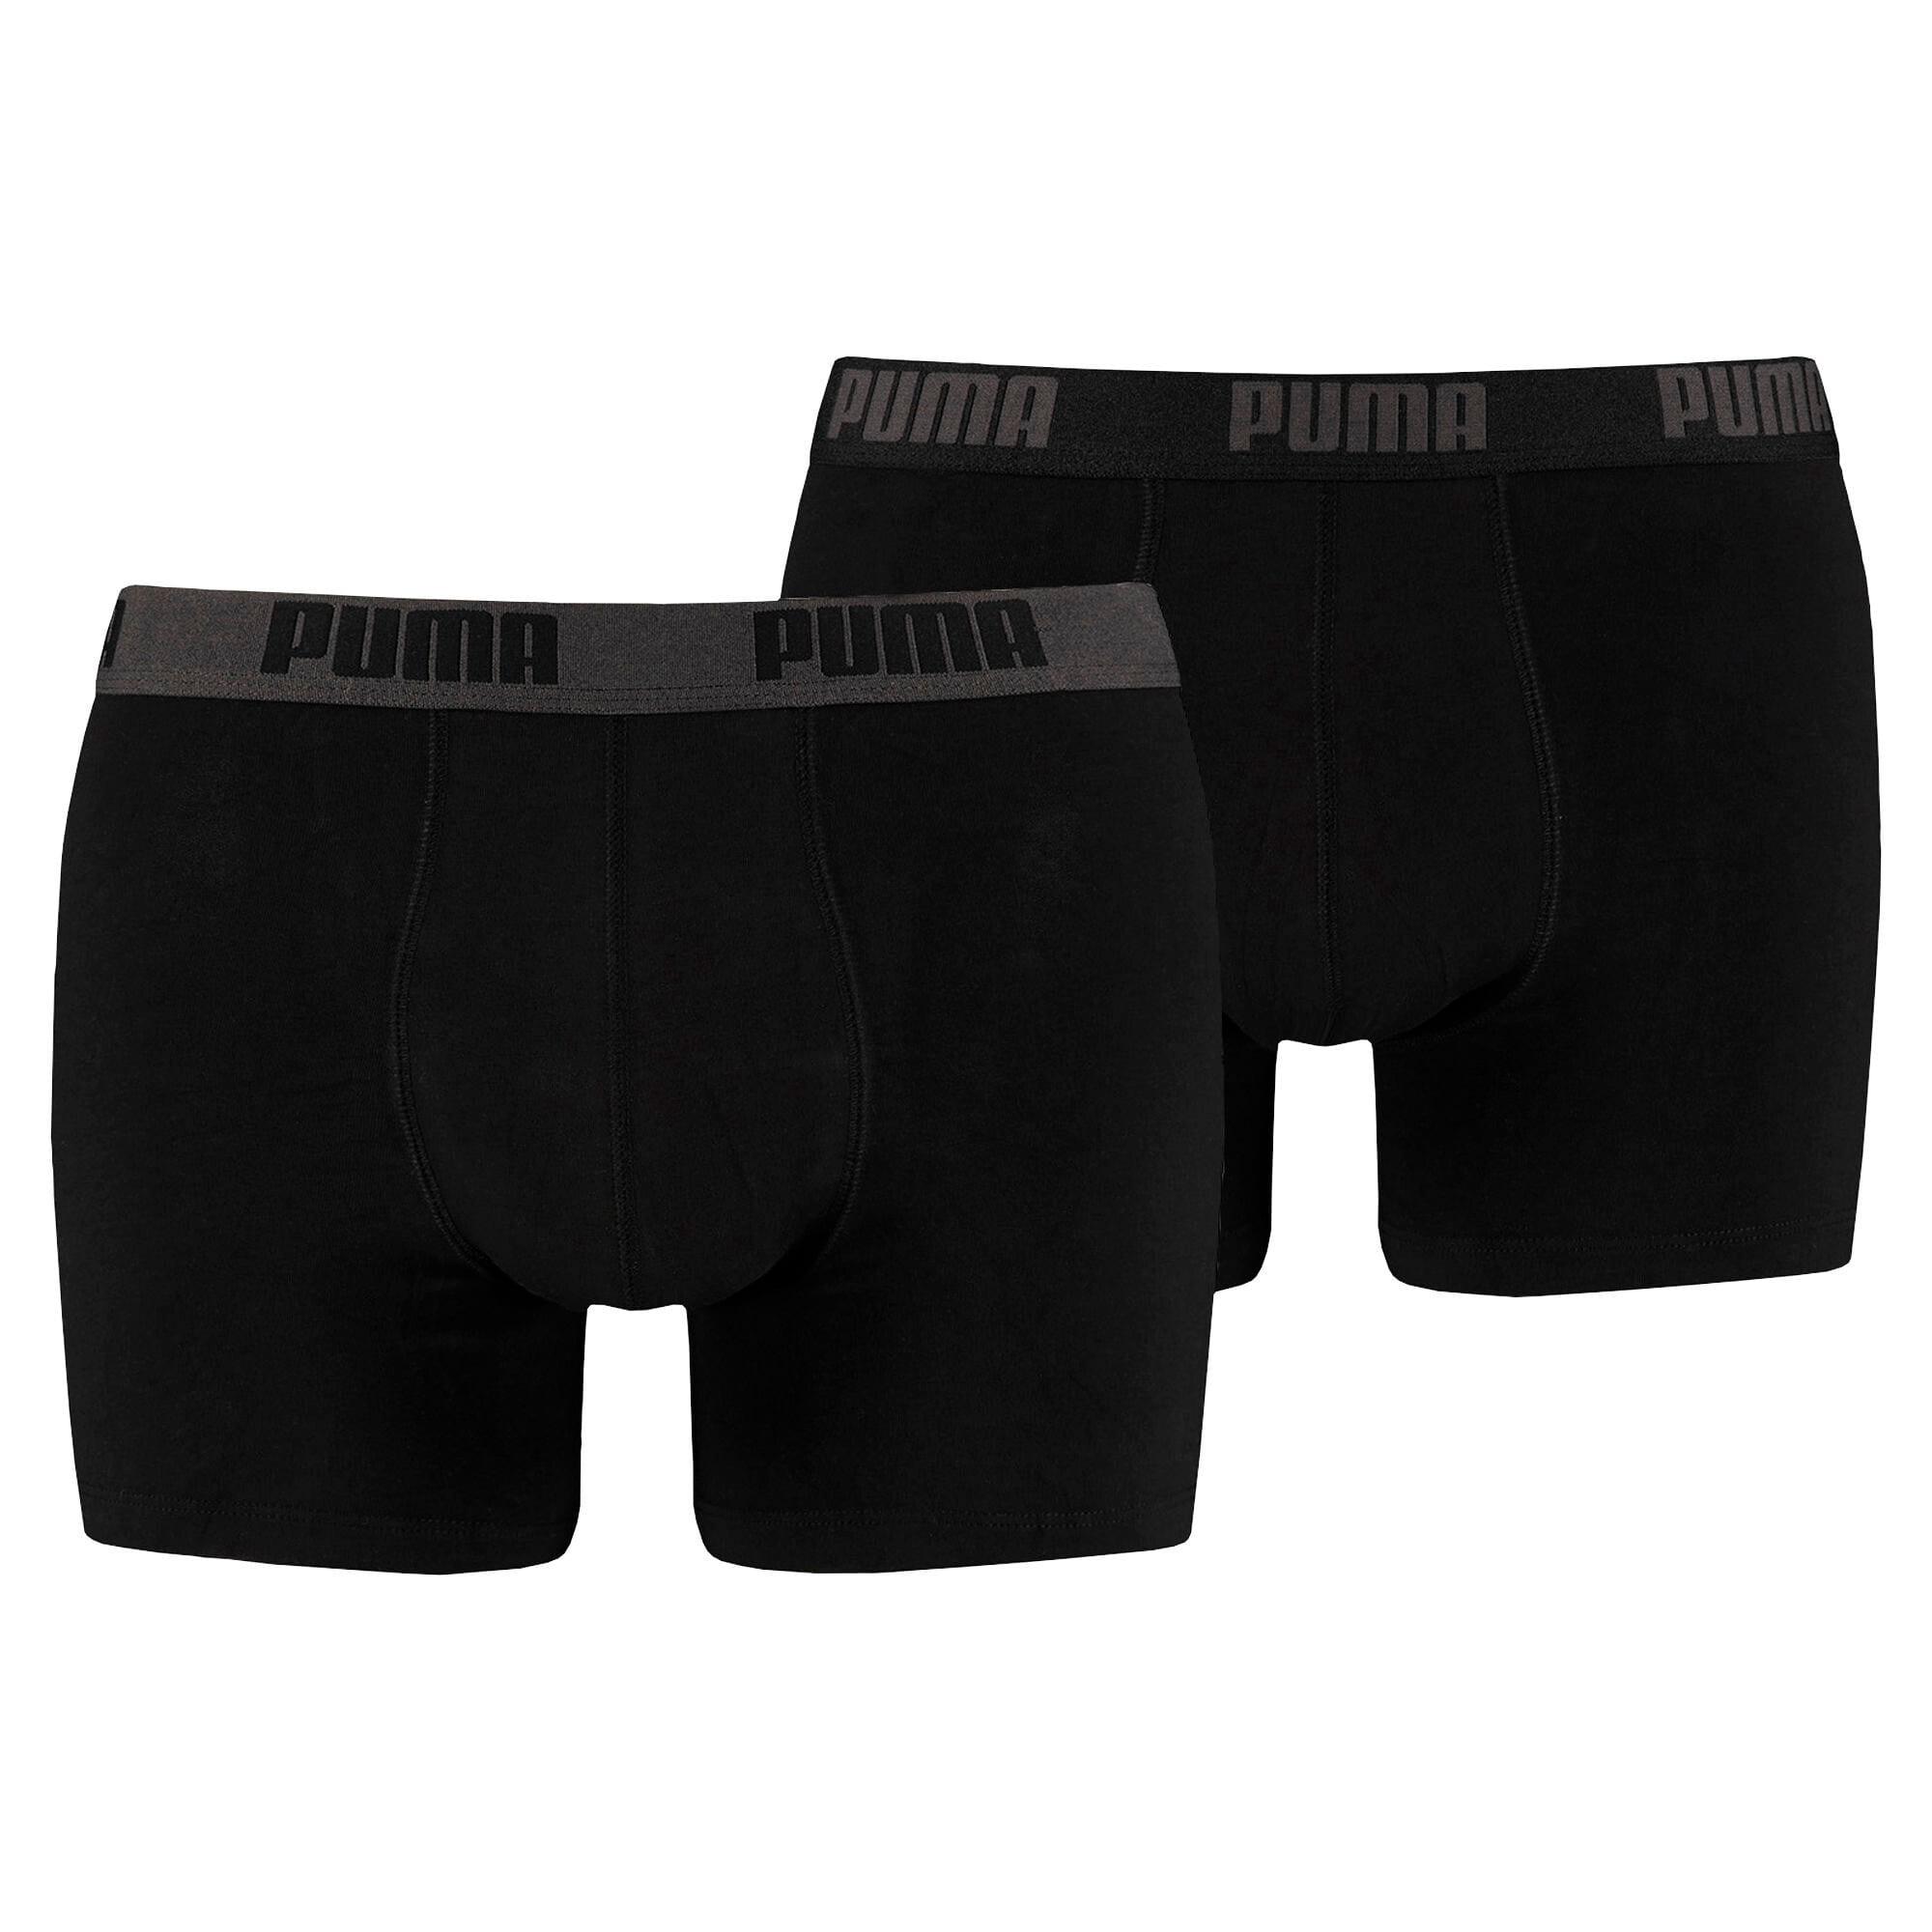 Thumbnail 1 of Basic Short Boxer  2 Pack, black / black, medium